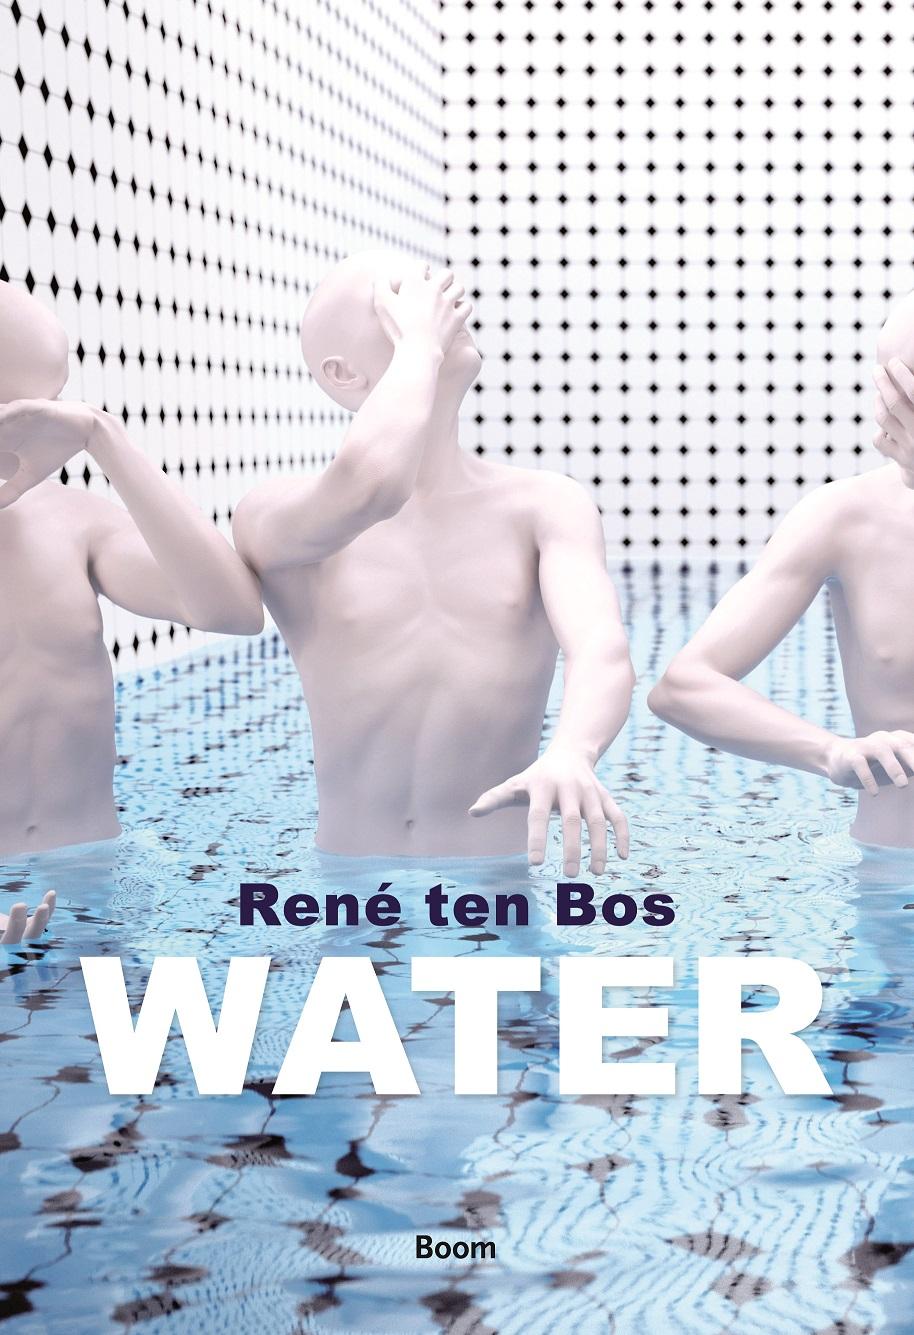 bosrtenwater_2d_hr